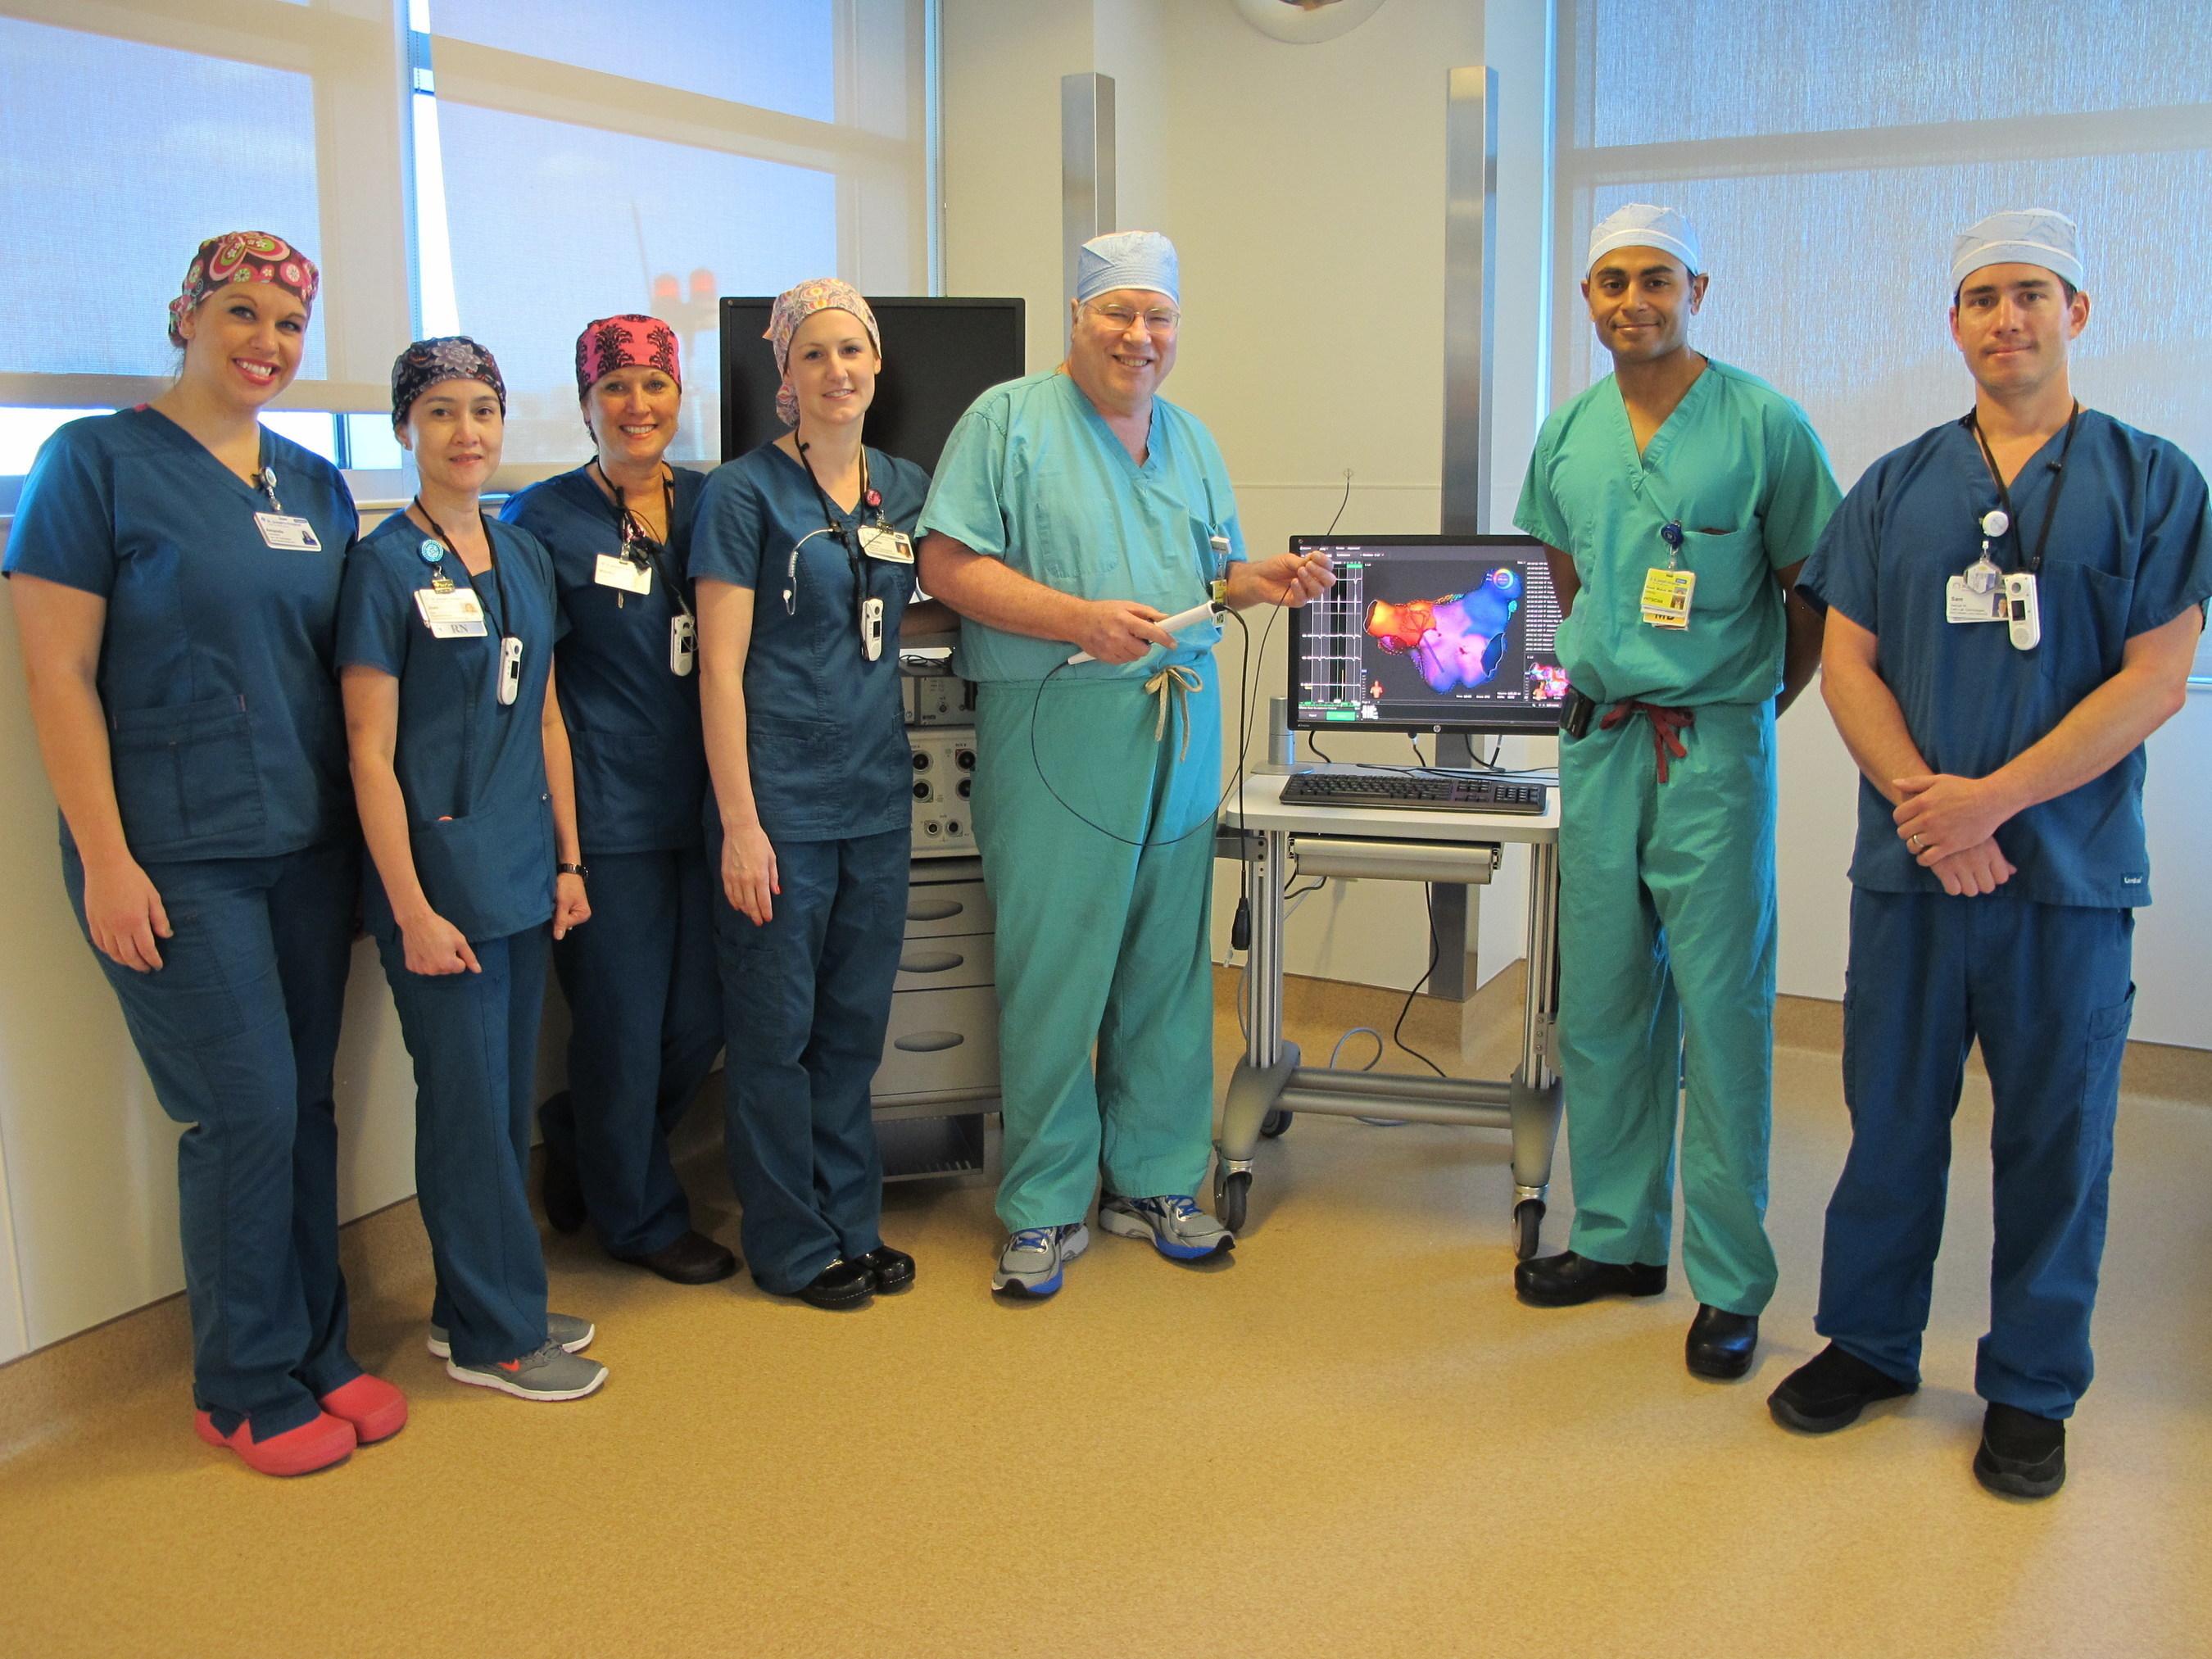 St. Joseph's Hospital team members Amanda Malone, registered cardiovascular invasive specialist (RCIS), ...